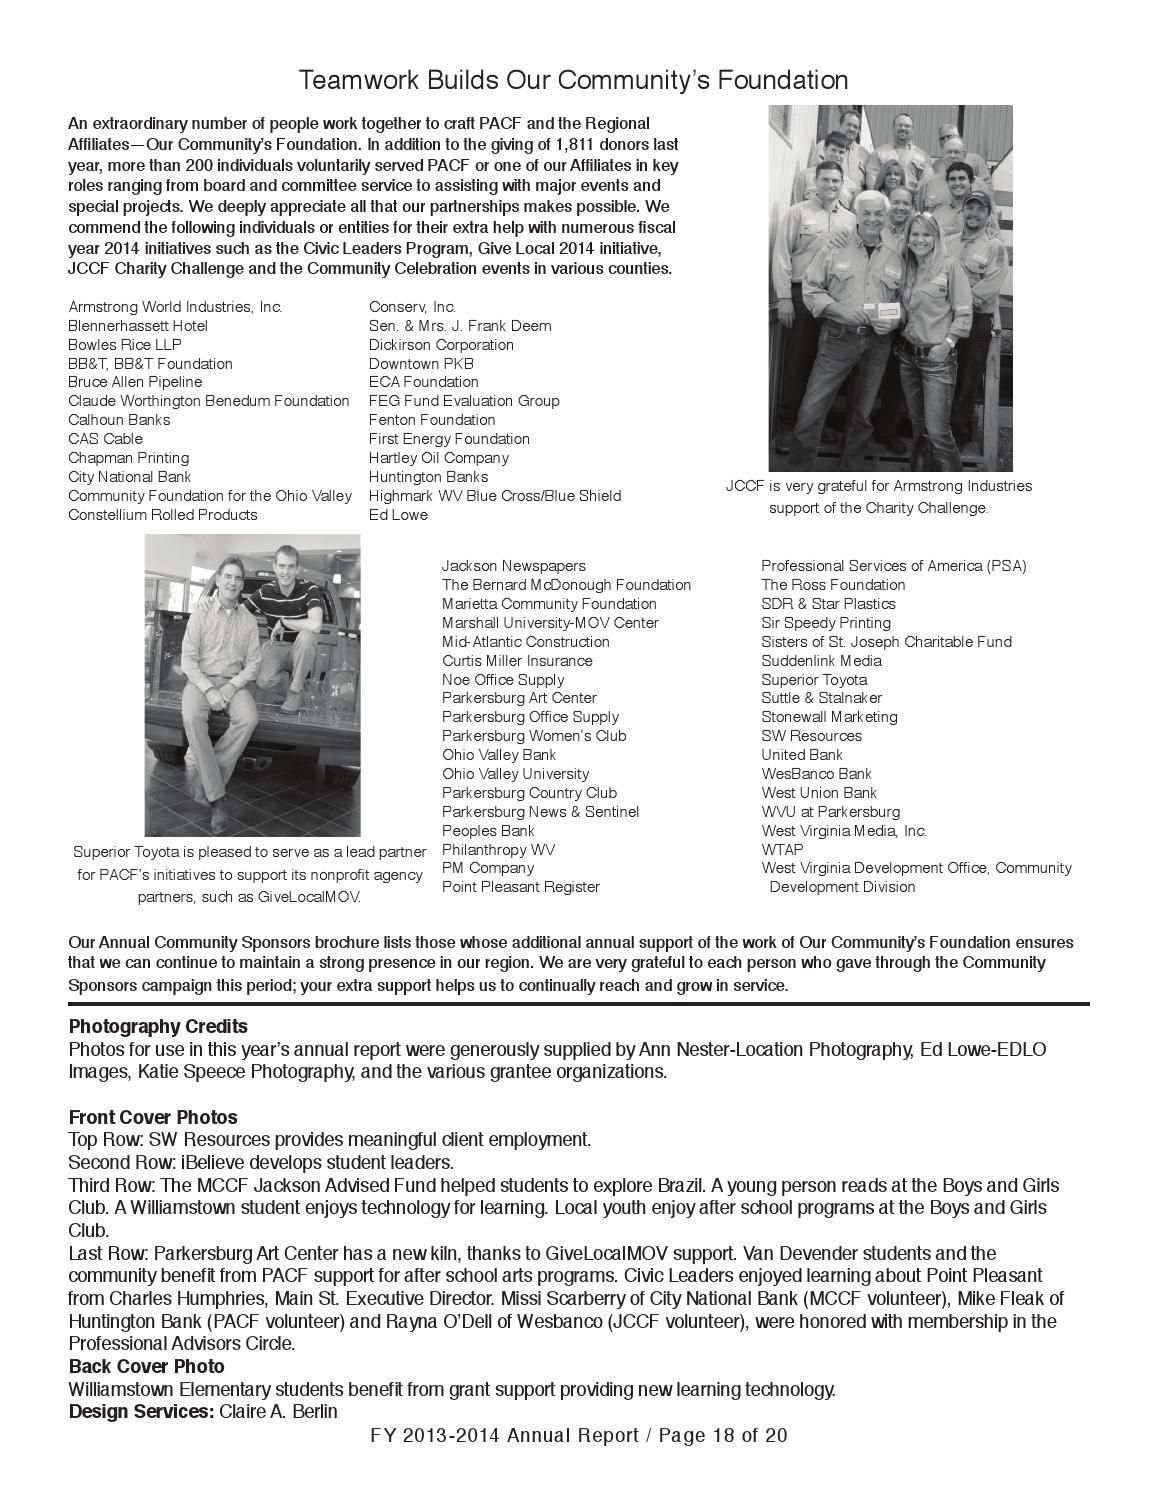 PACF Annual Report 2014 By Parkersburg Area Community Foundation U0026 Regional  Affiliates (PACF)   Issuu